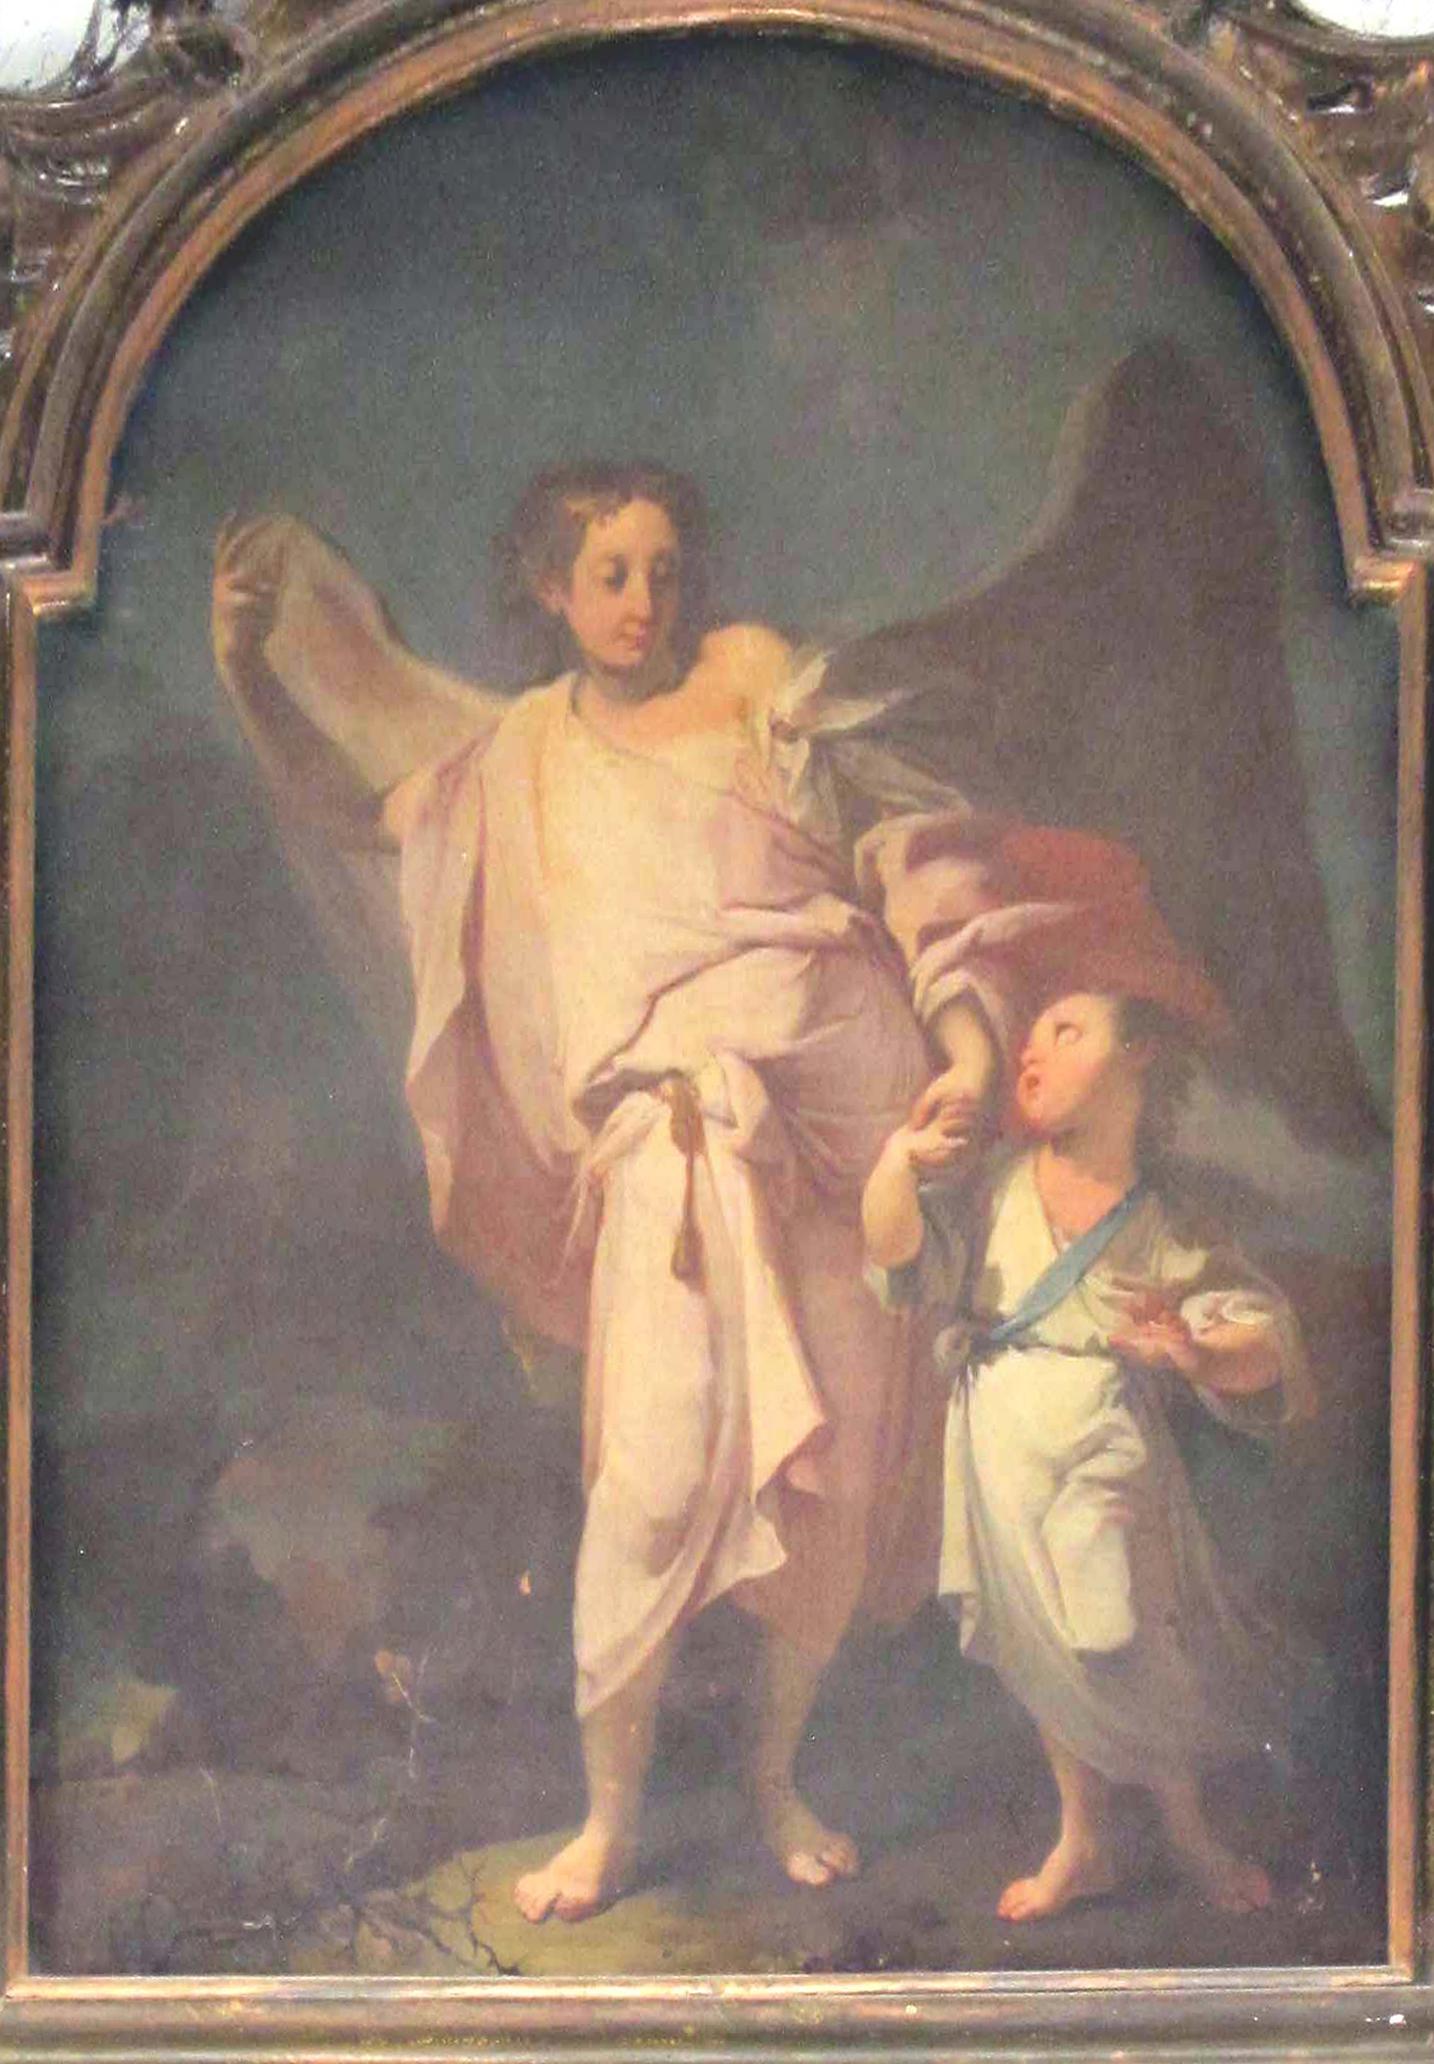 IGNOTO PITTORE PIEMONTESE, Angelo custode (metà del sec. XVIII).